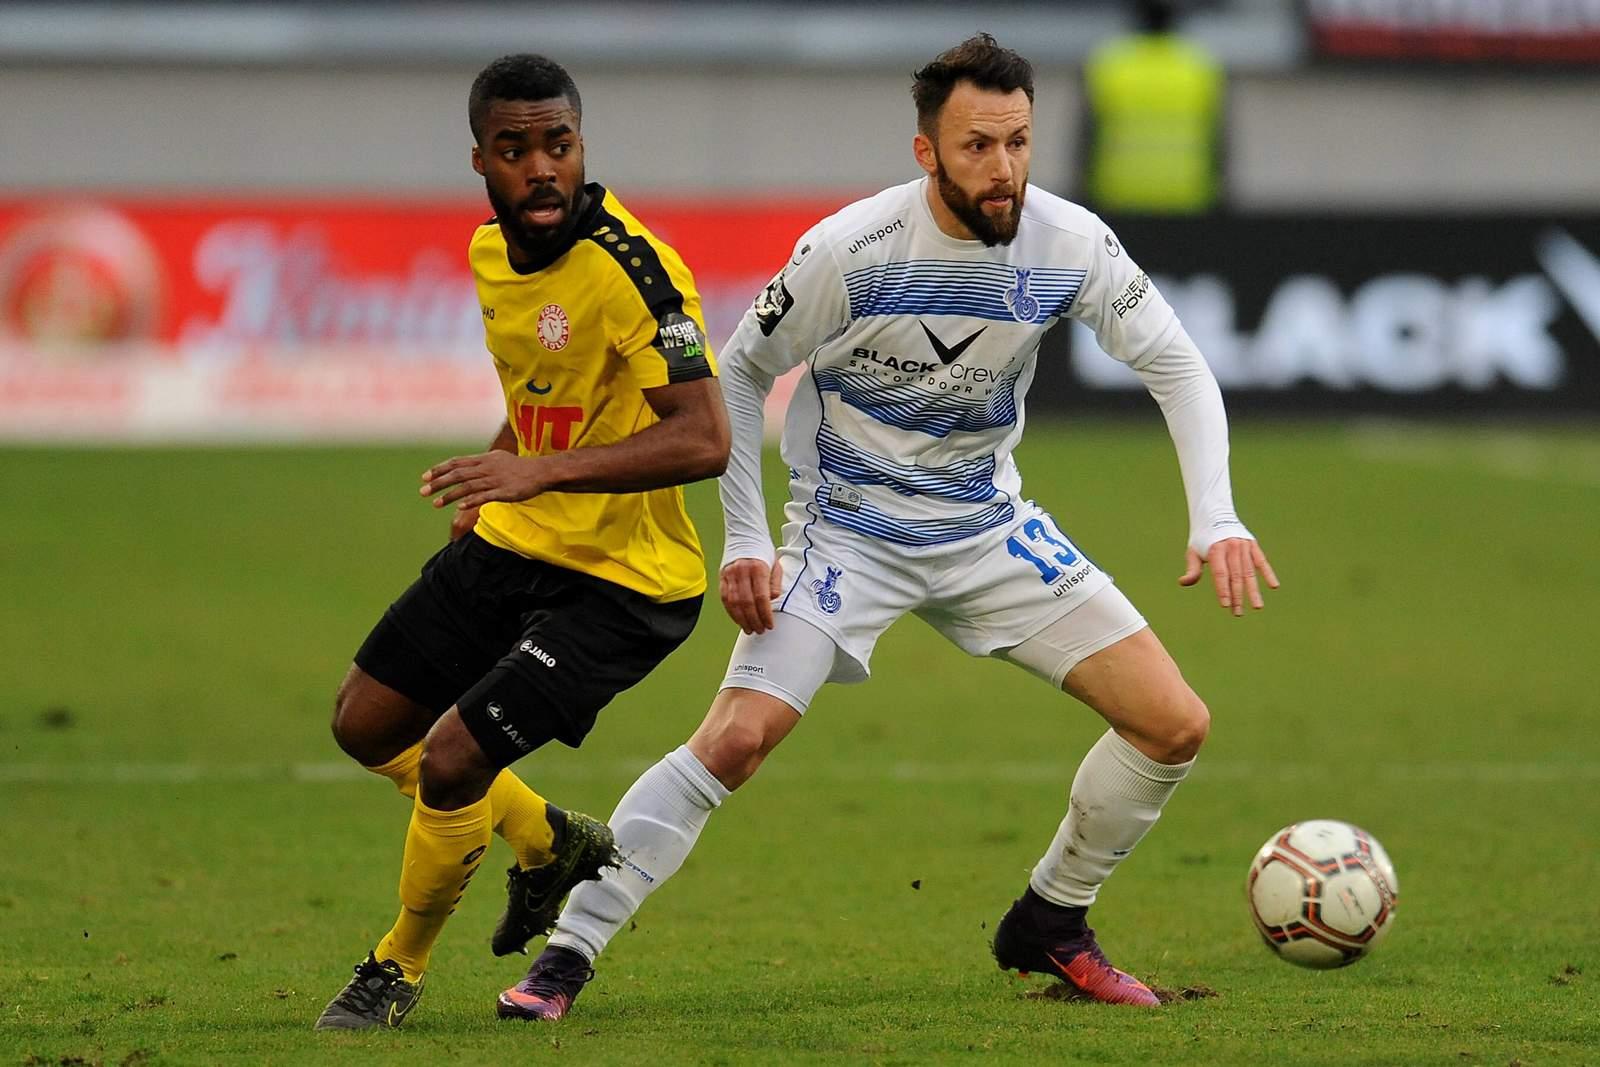 Zlatko Janjic (Duisburg) und Kusi Kwame (Fortuna Köln)